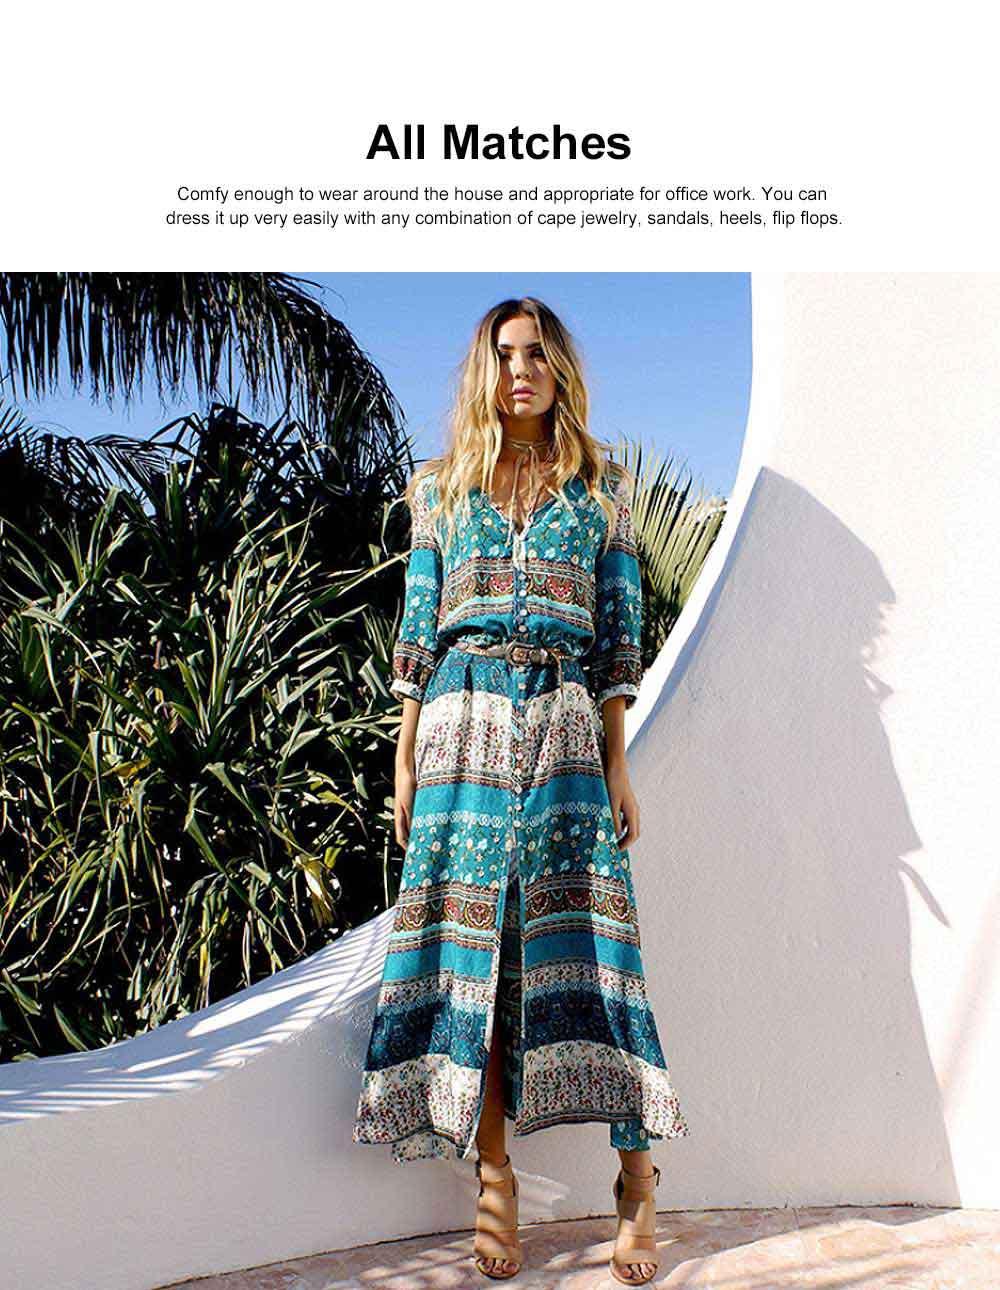 Women Floral Printed Maxi Dress, Deep V-neck Long Beach Dresses, Bohemian Side Split Dresses with Buttons 1